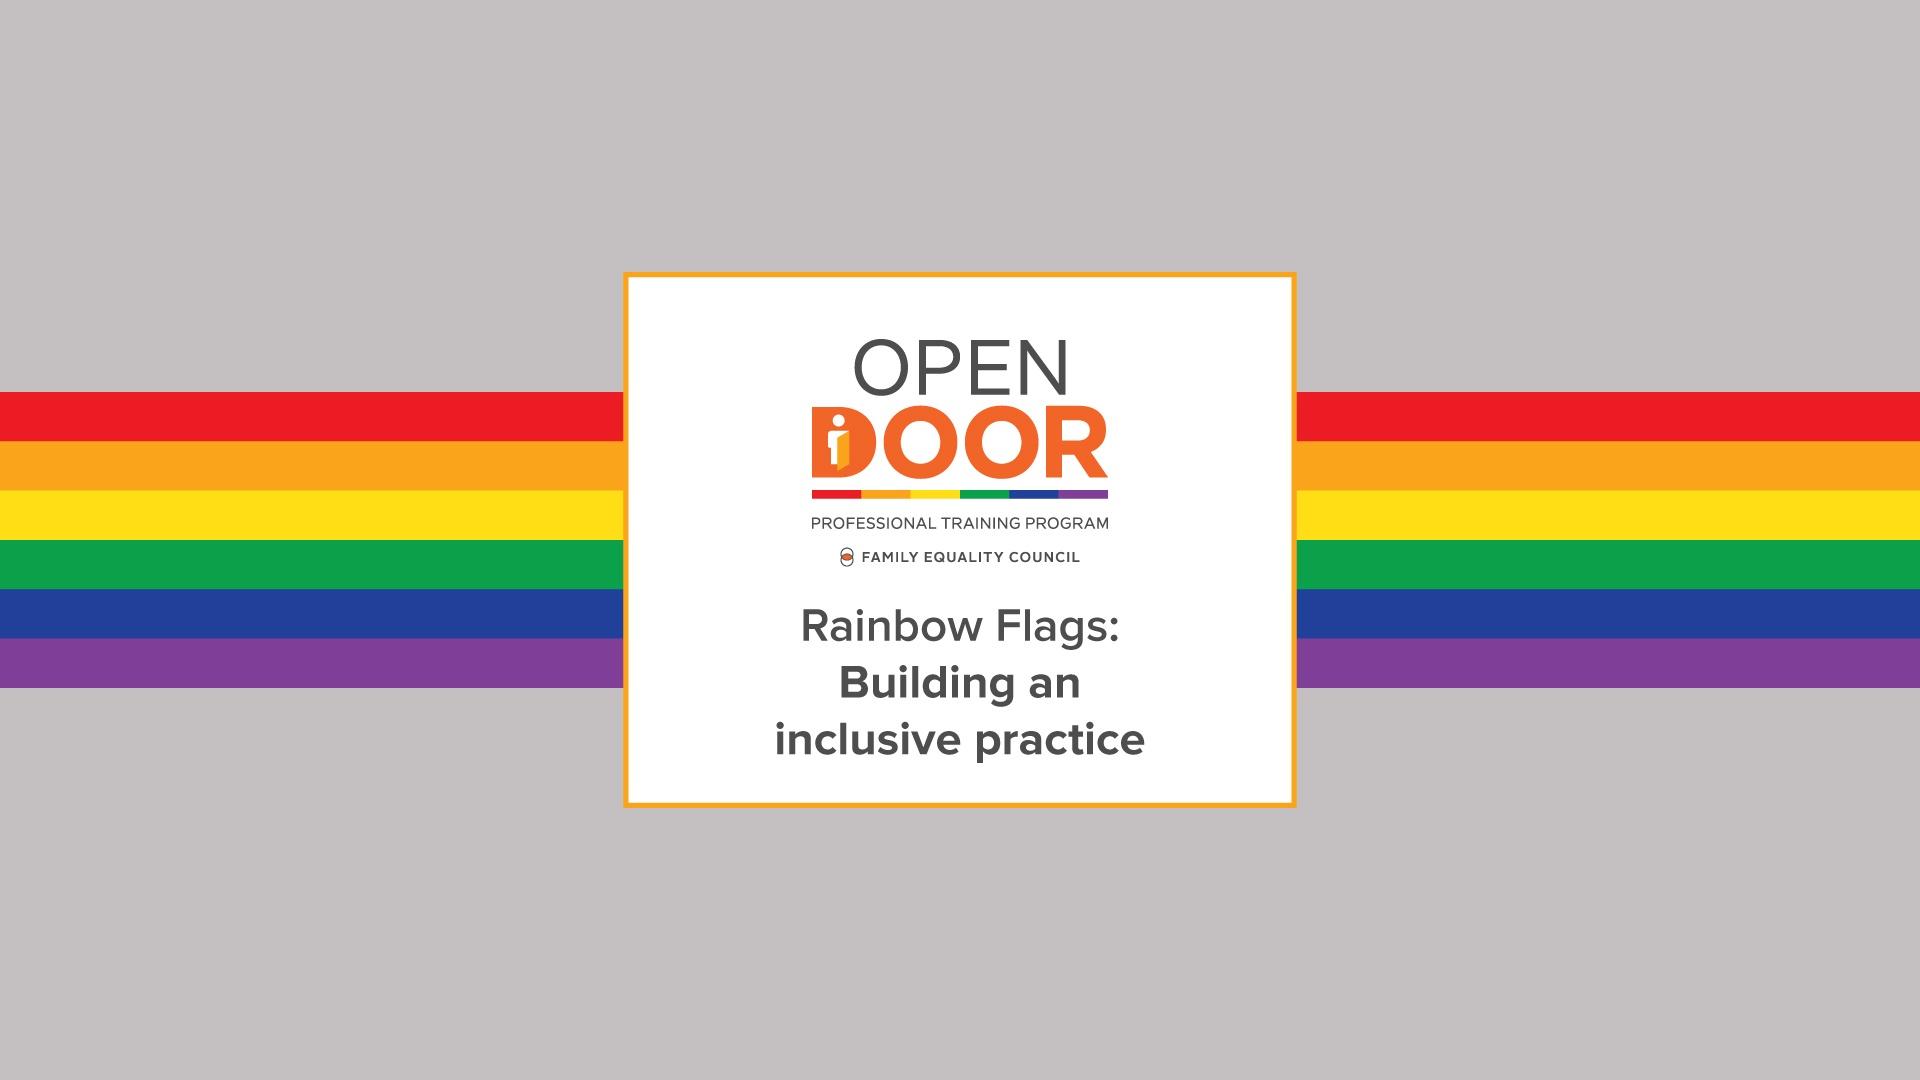 Rainbow Flags: Building an inclusive practice